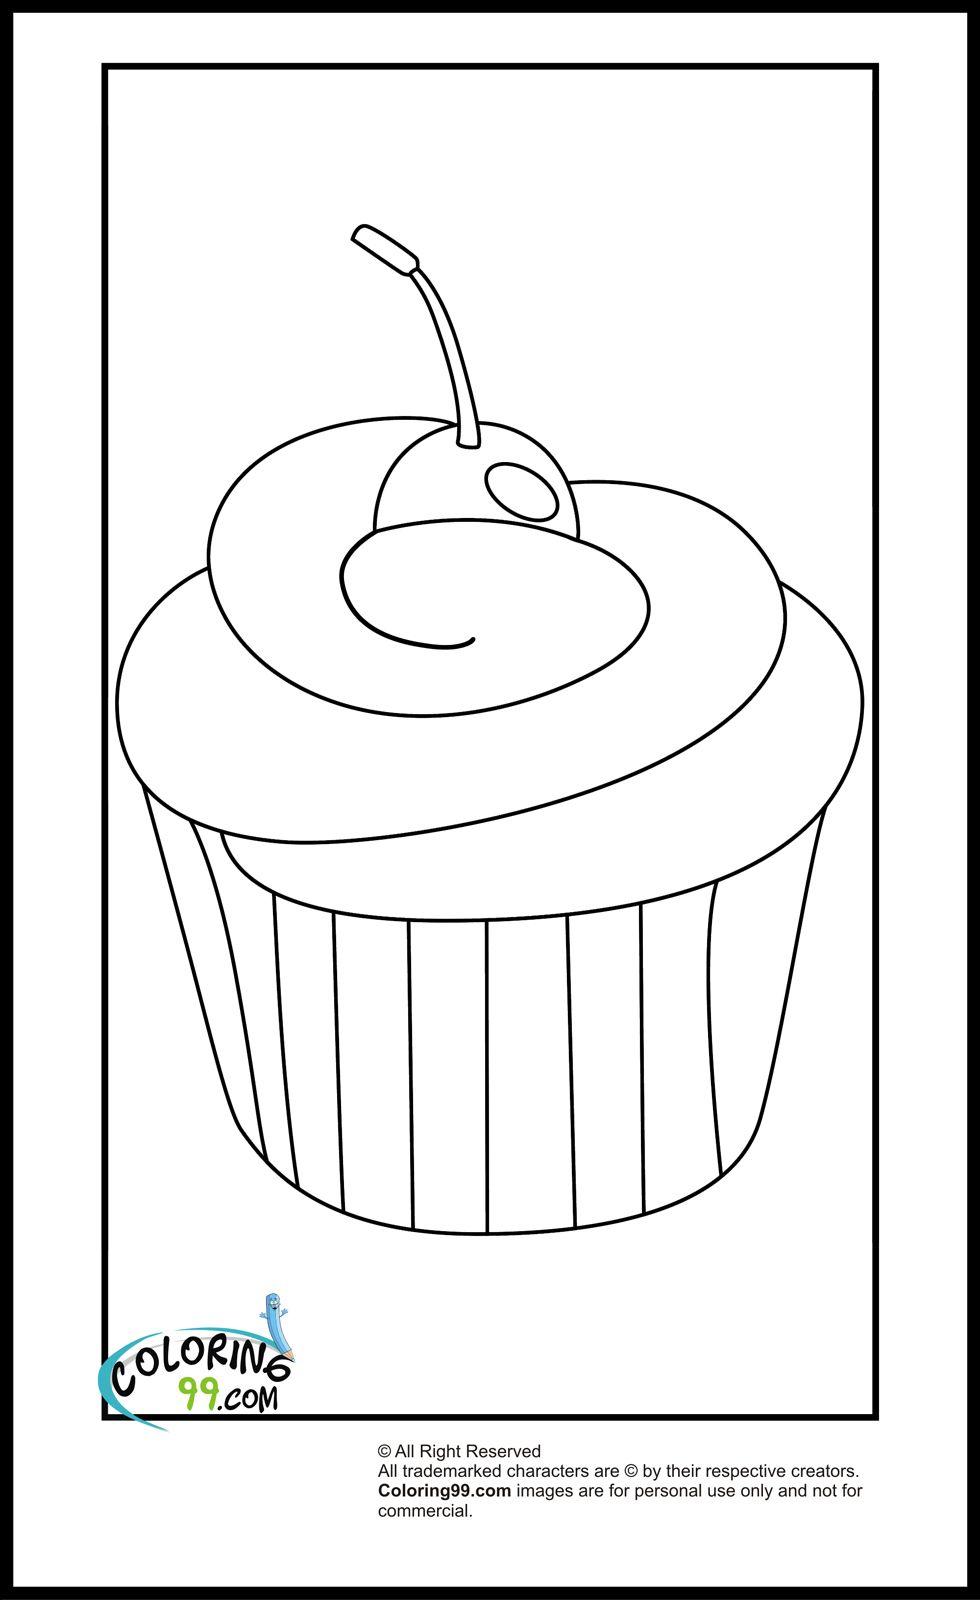 Cupcake Coloring Pages Cupcake Coloring Pages Fruit Coloring Pages Easy Coloring Pages